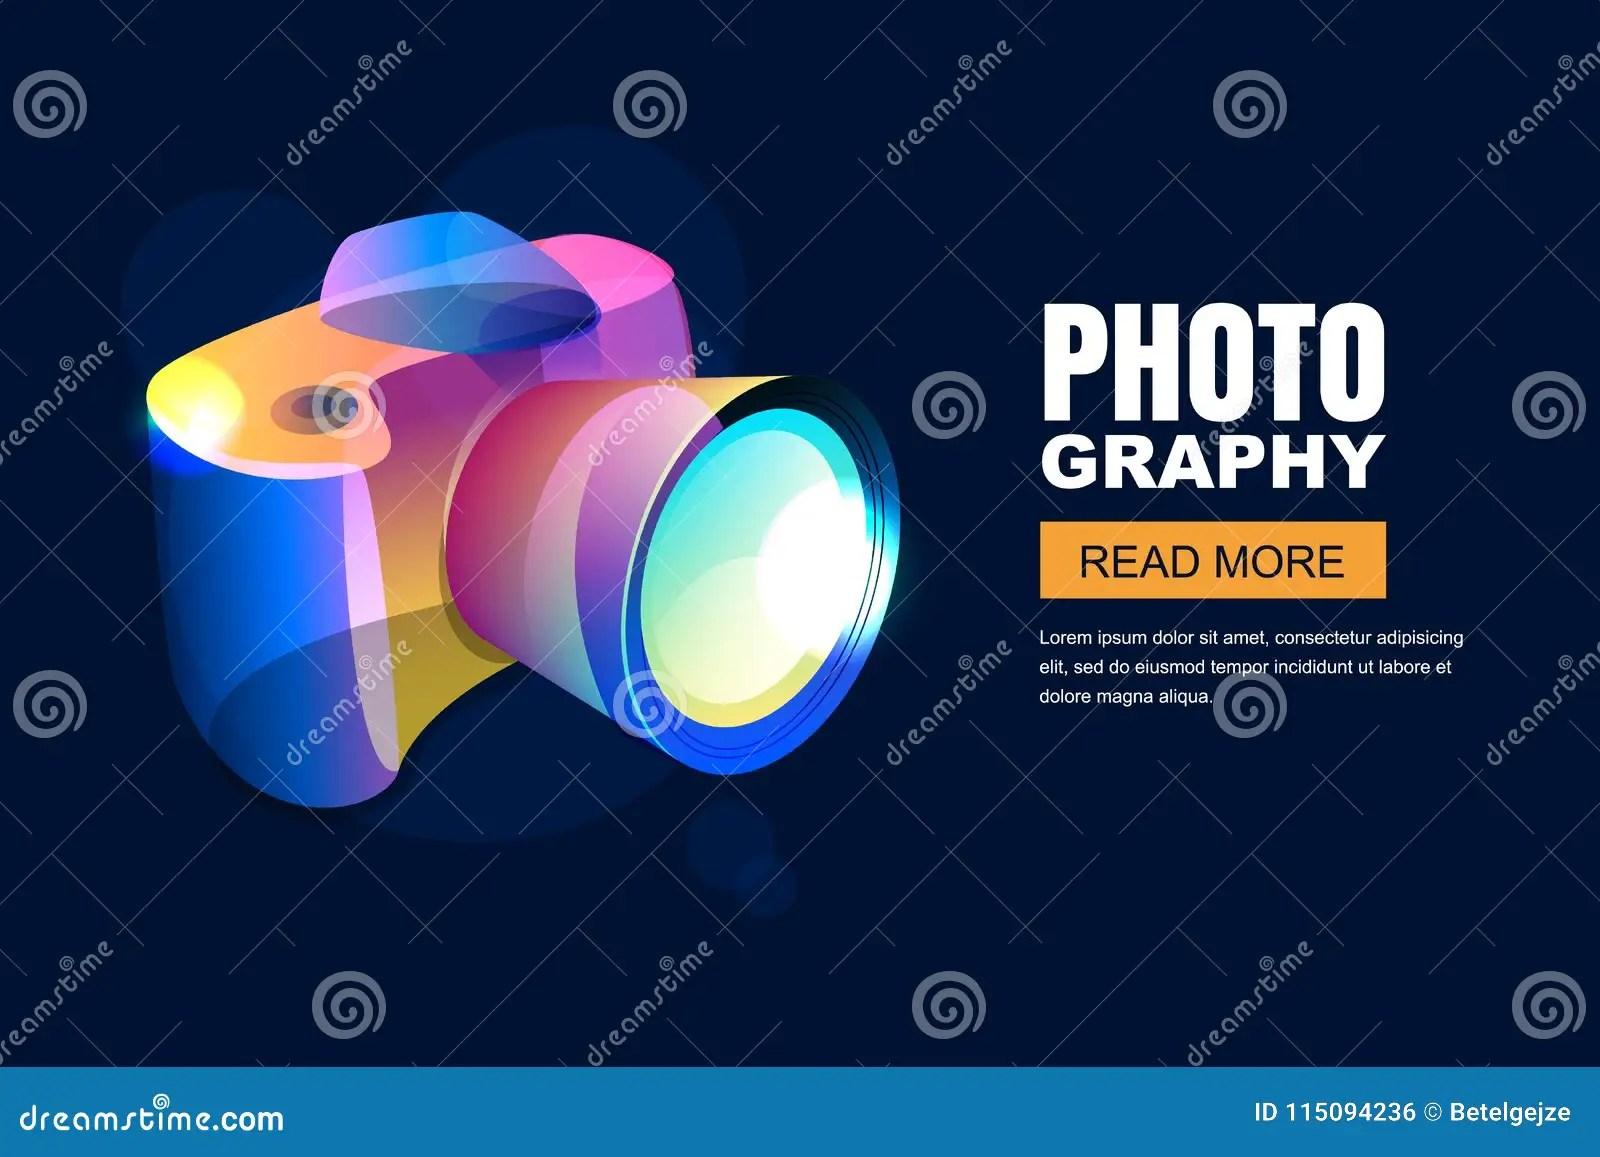 vector glowing neon photo